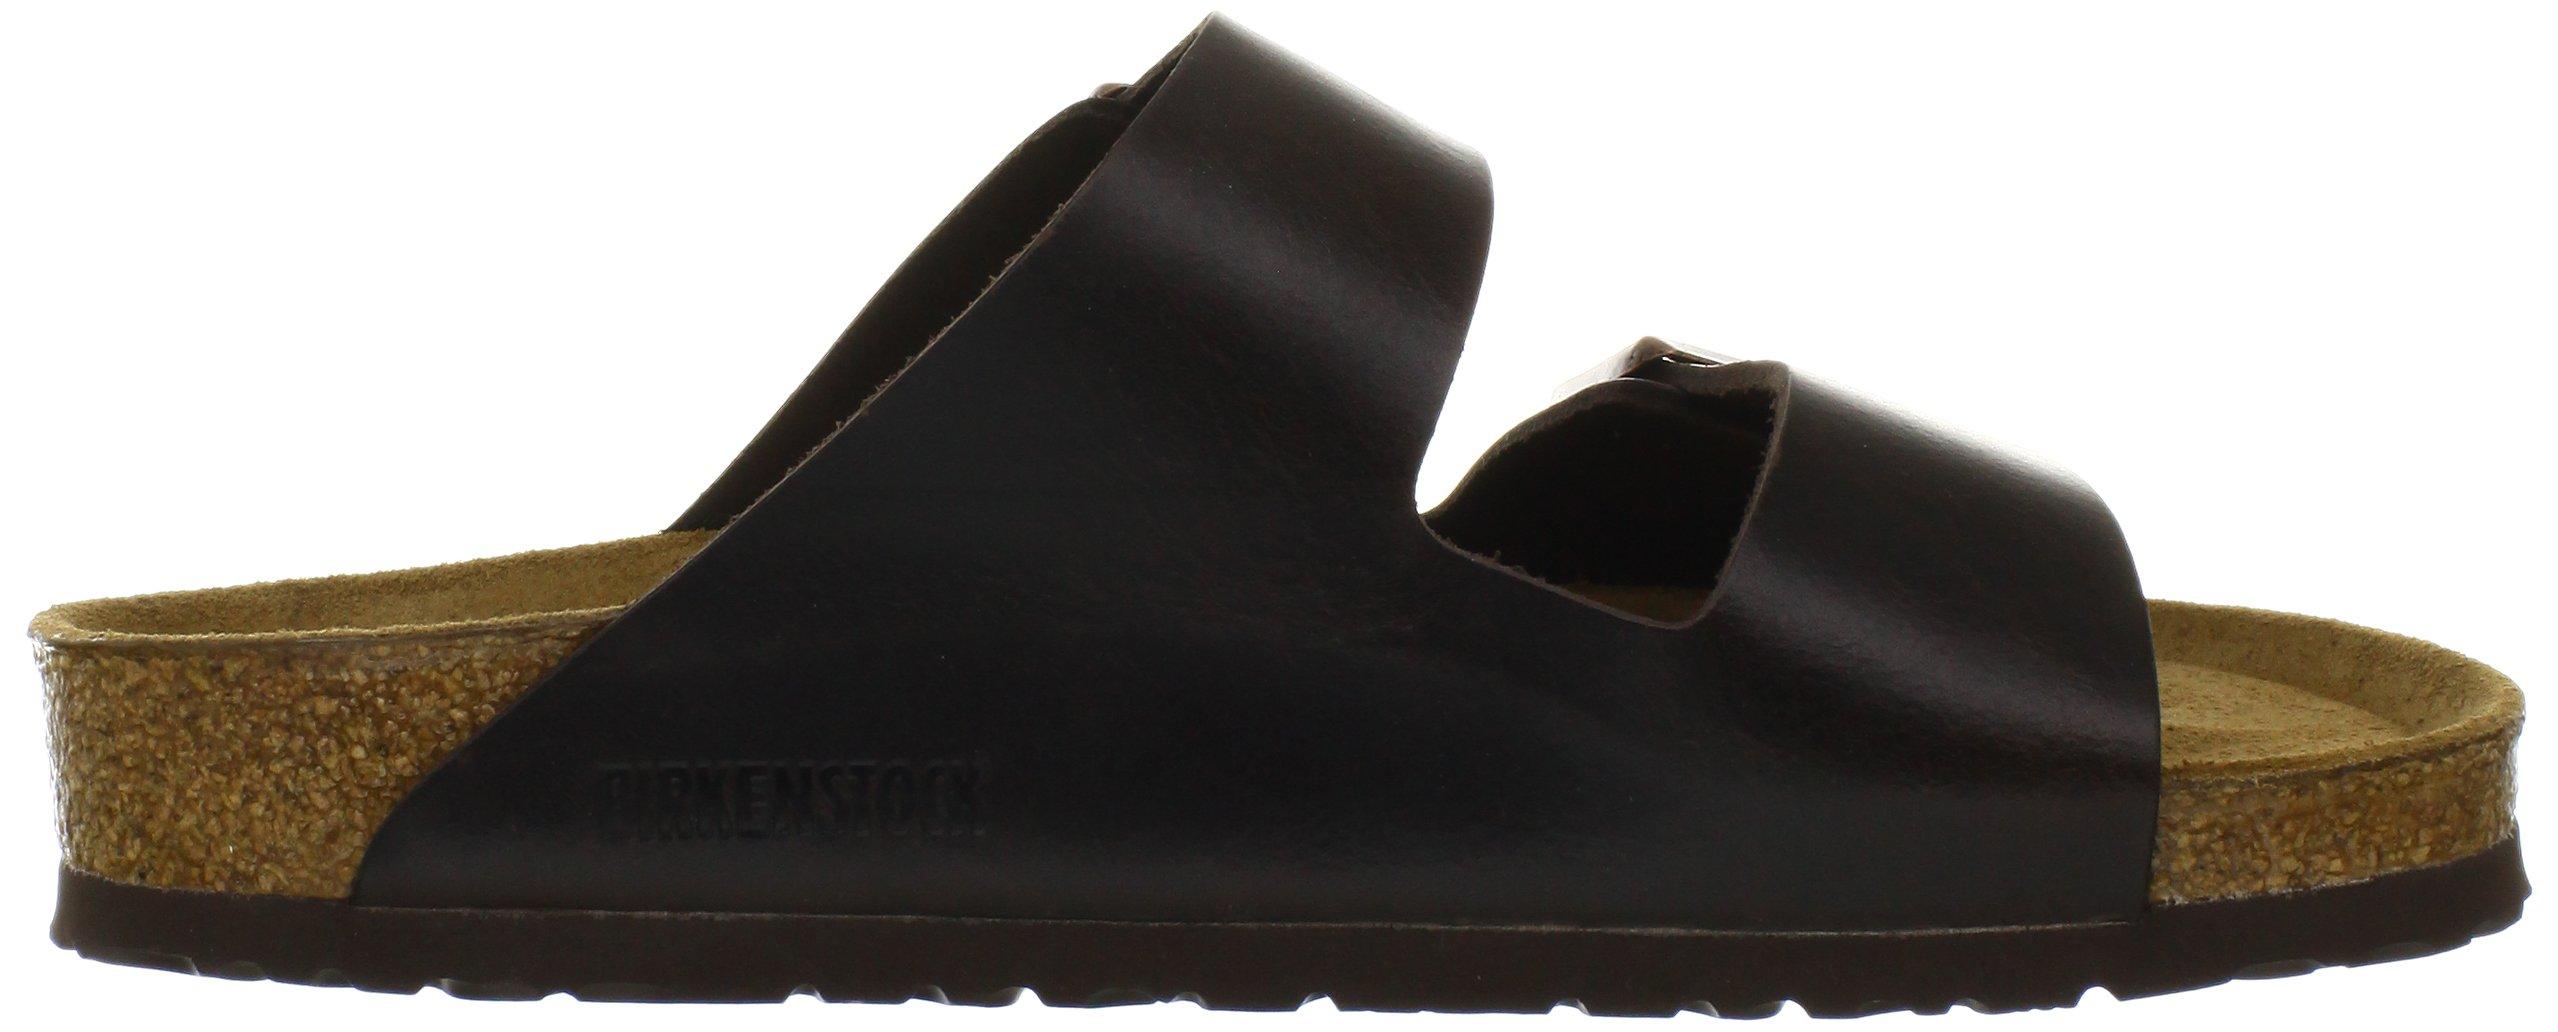 Birkenstock Unisex Arizona Brown Amalfi Leather Sandals - 39 M EU / 8-8.5 B(M) US by Birkenstock (Image #6)